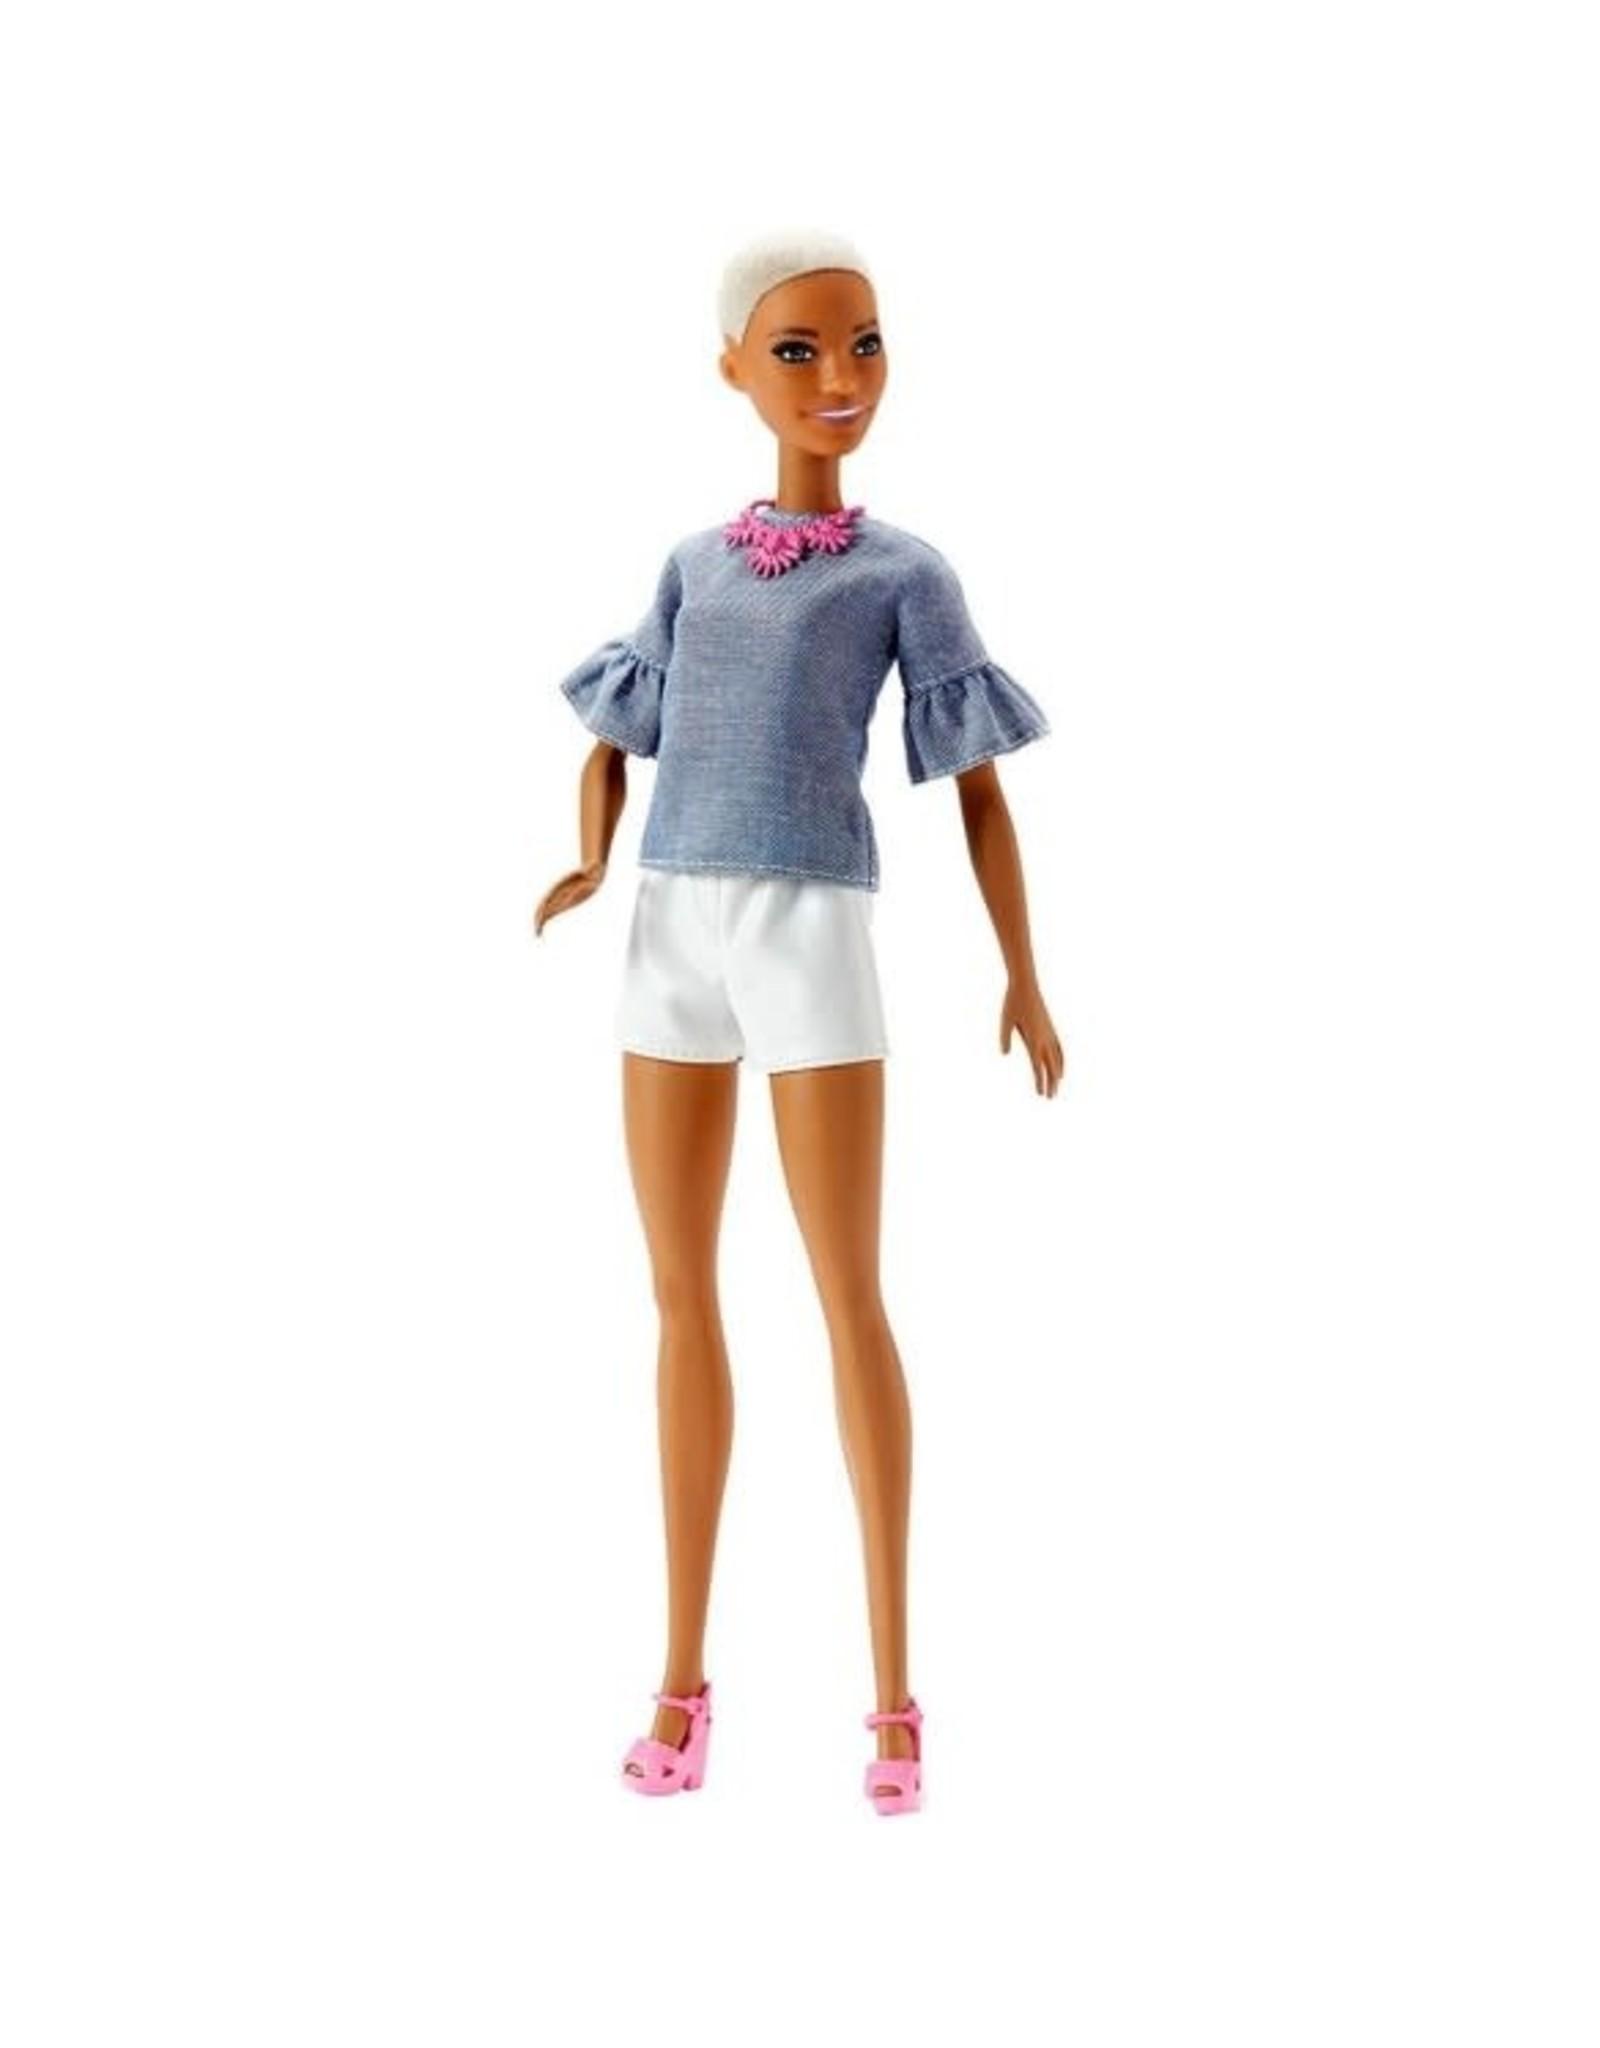 MATTEL Barbie Fashionista Tienerpop Buzz-cut En Witte Sho